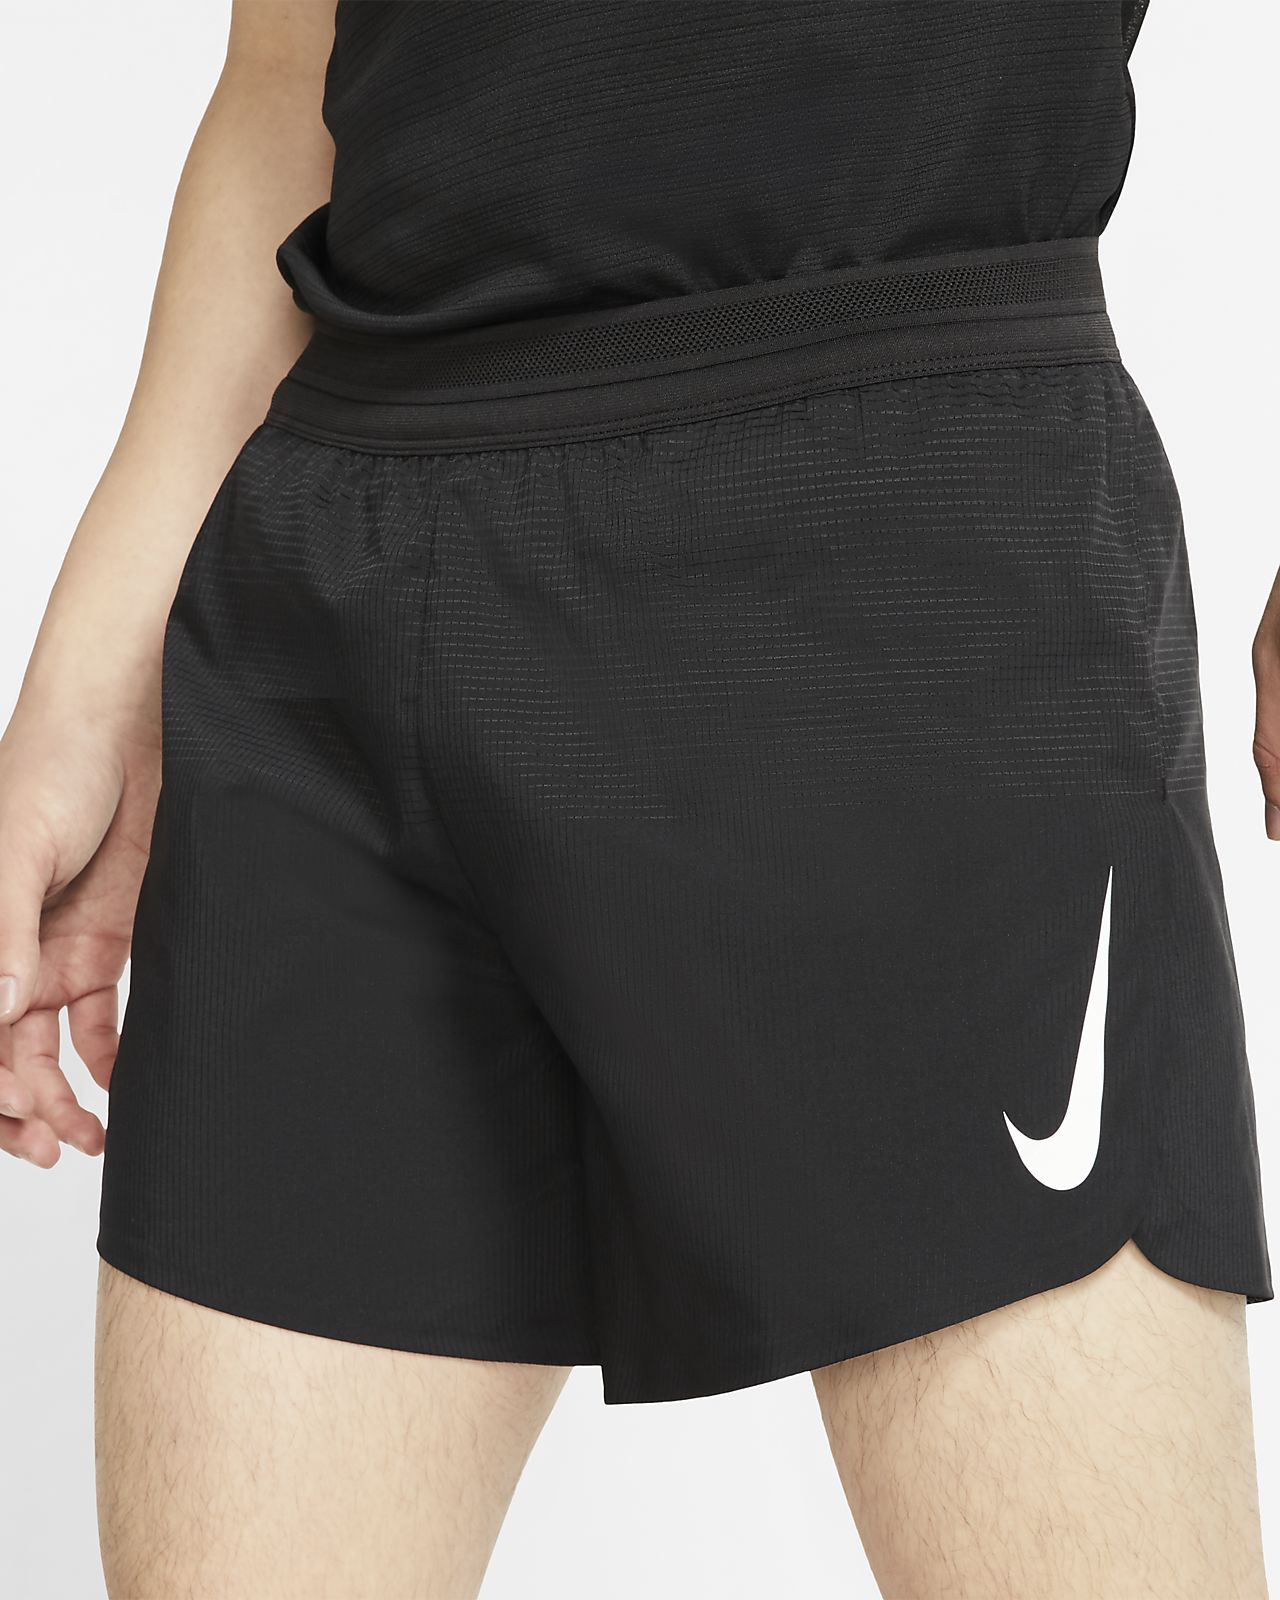 Nike AeroSwift (London) Hardloopshorts voor heren (12,5 cm)